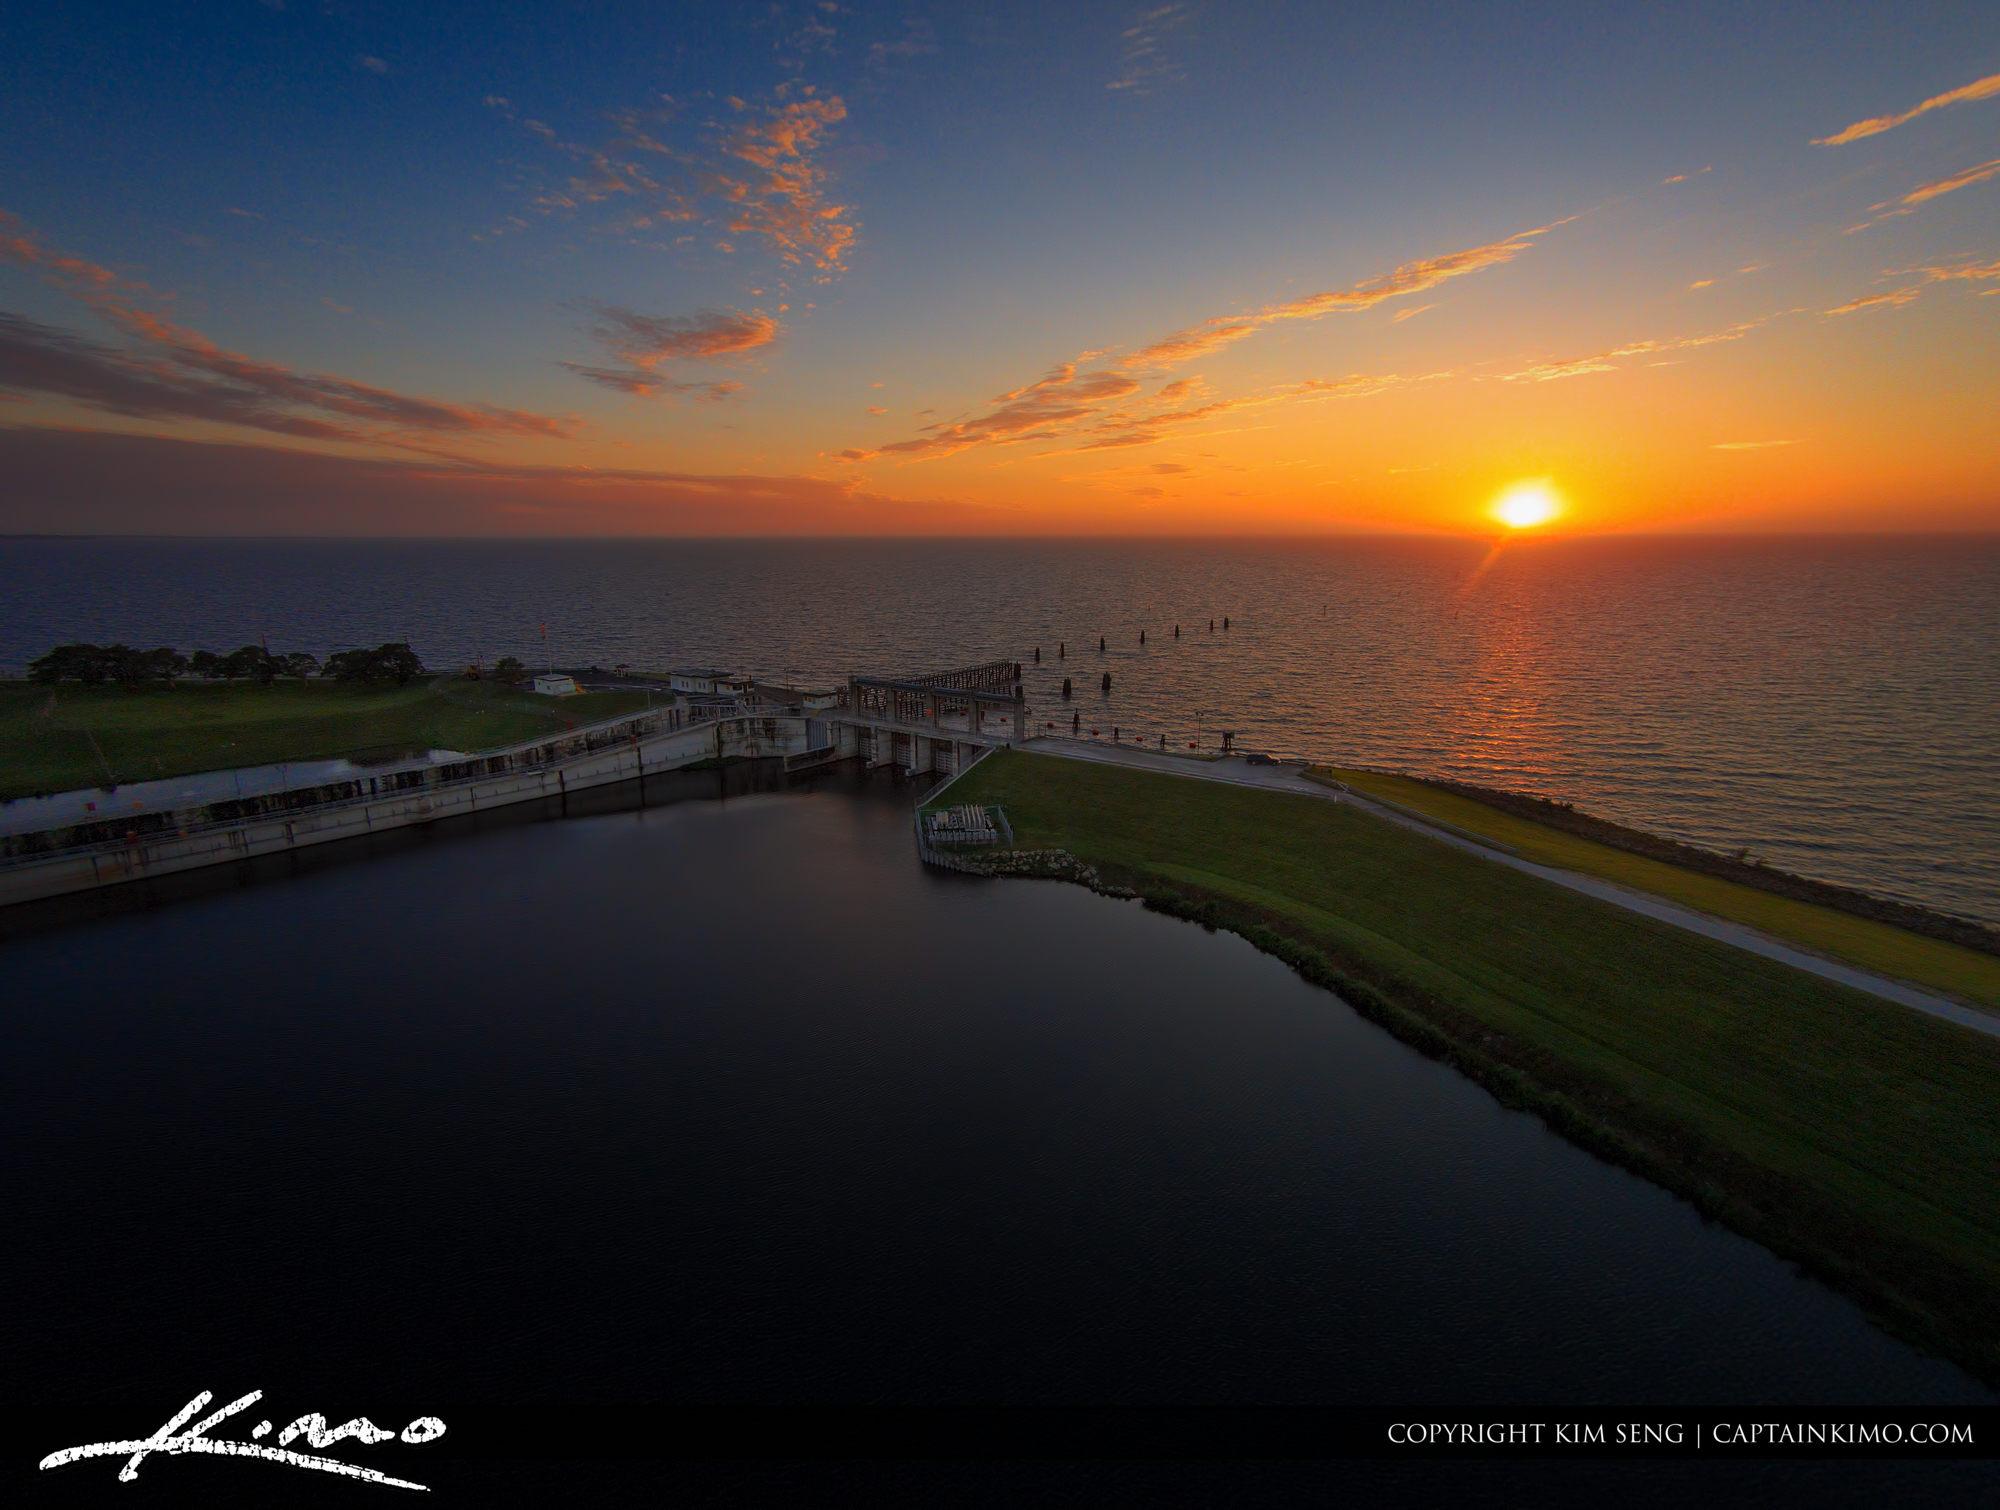 Okeechobee Lake Sunset from Port Mayaca Florida